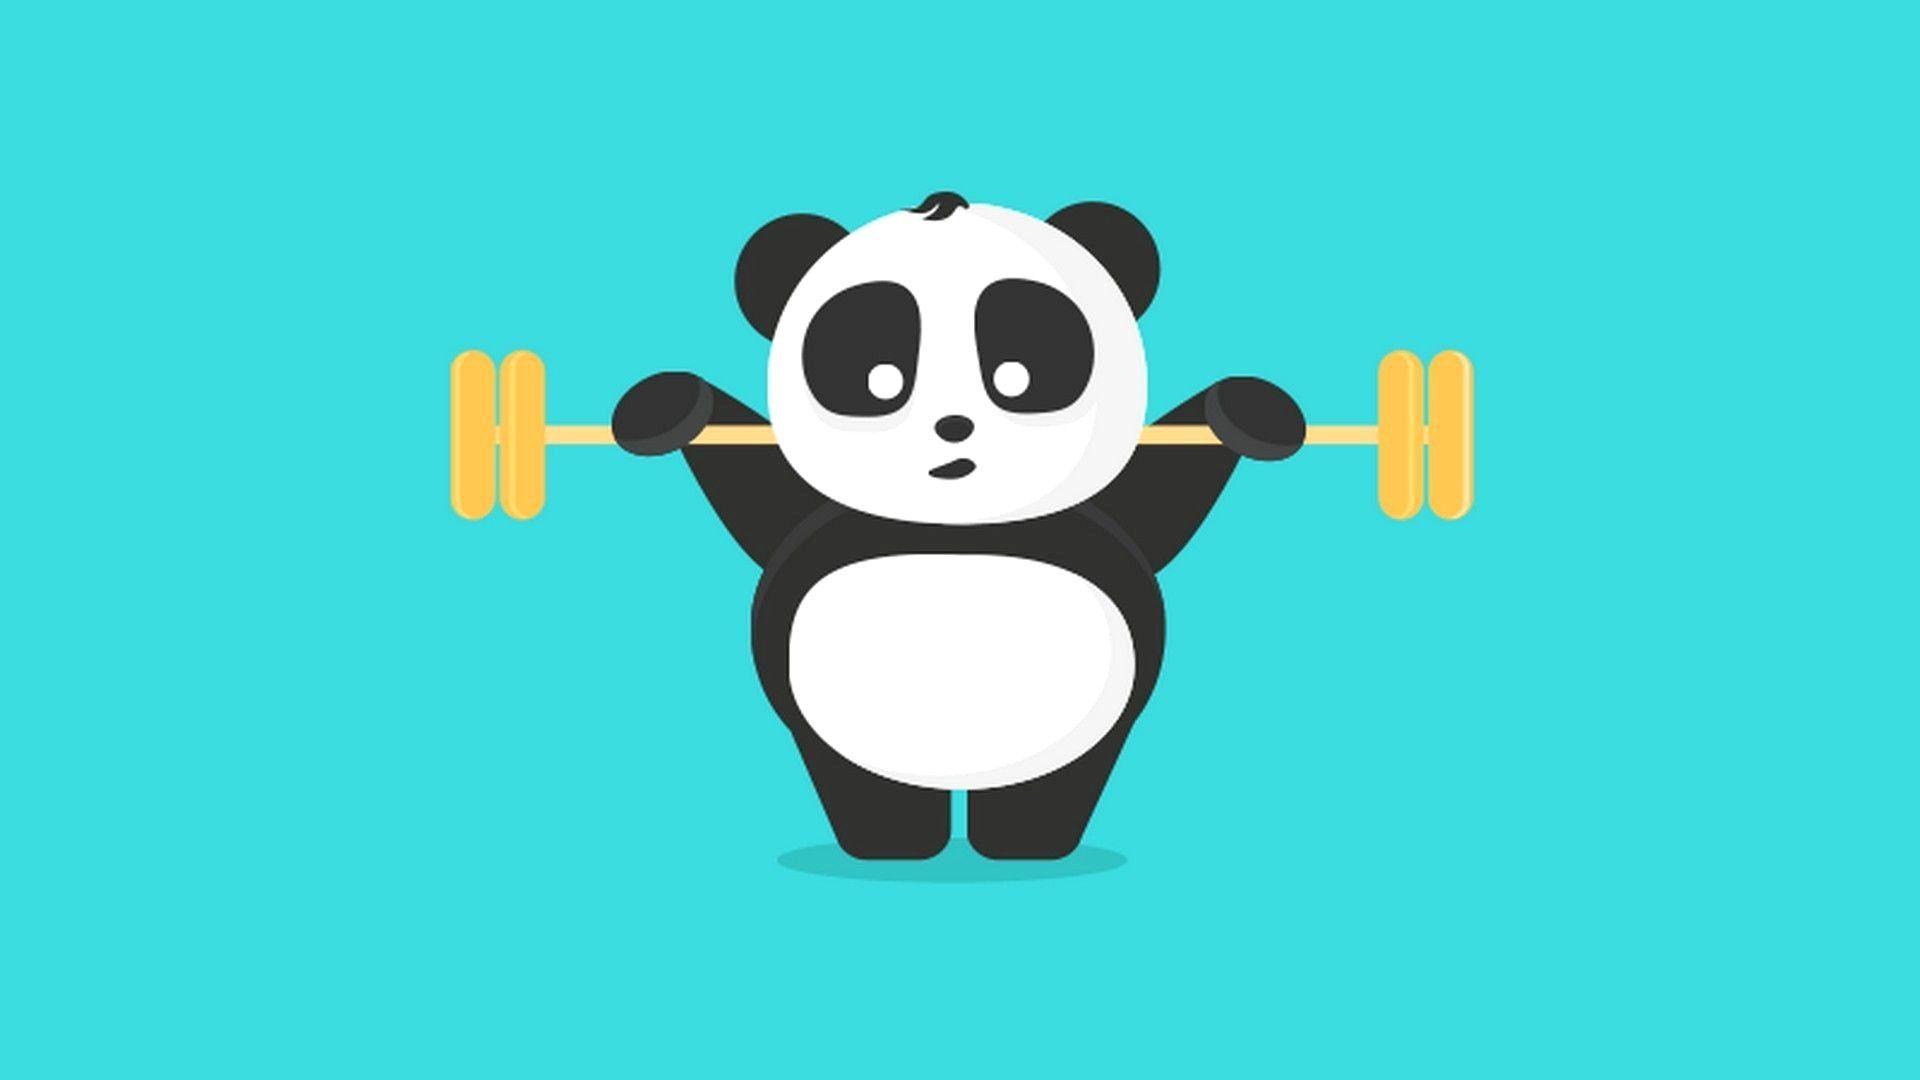 Animated Panda Wallpapers Top Free Animated Panda